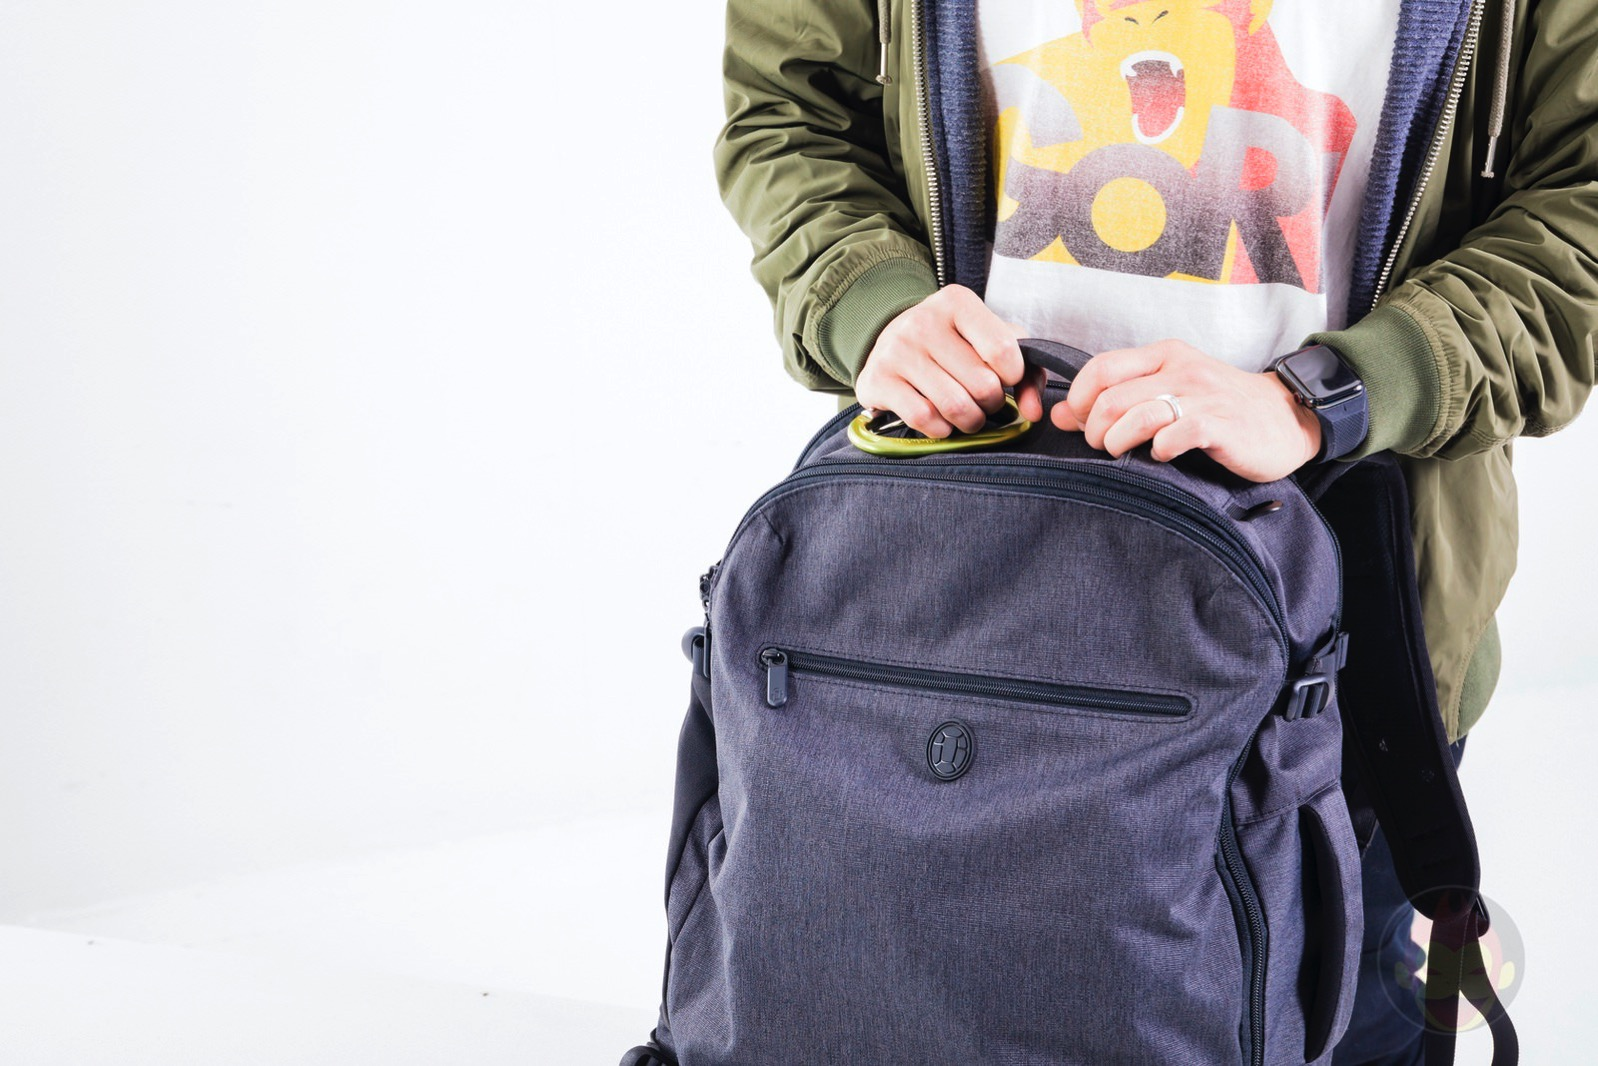 Tortuga-Setout-Backpack-35liter-review-12.jpg